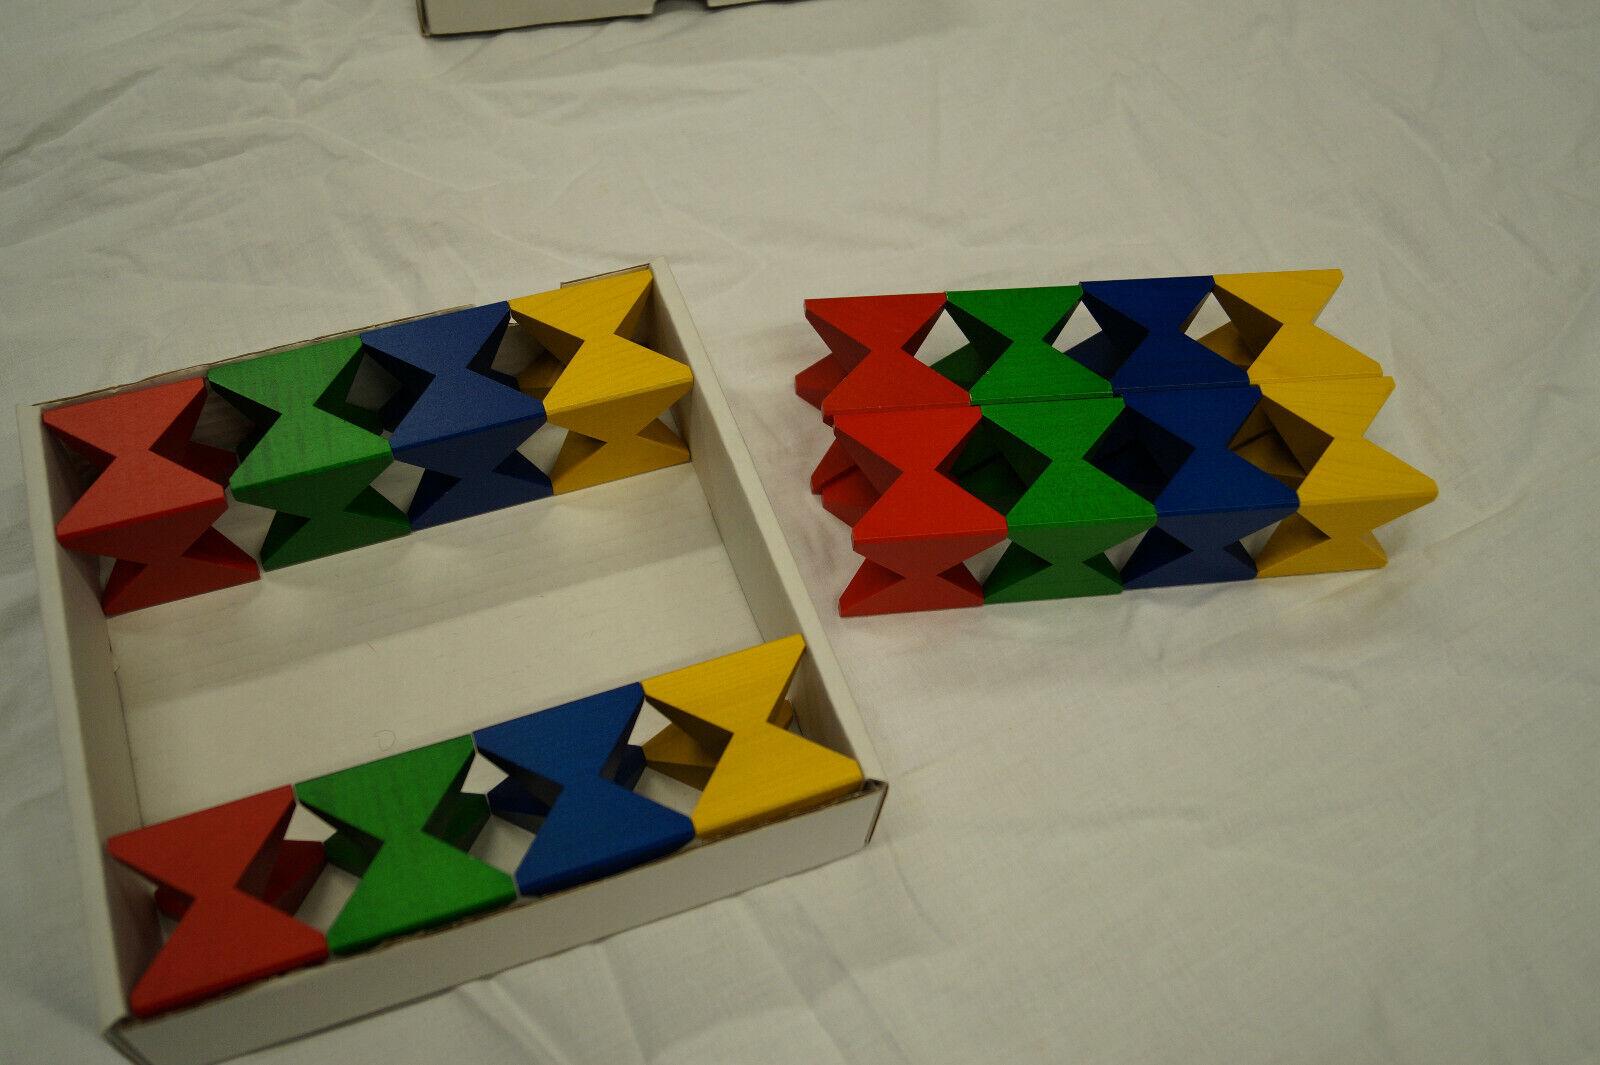 Naef-Spiel, Spielzeug Holz, Swiss made, Nr. 9401, neuwertig